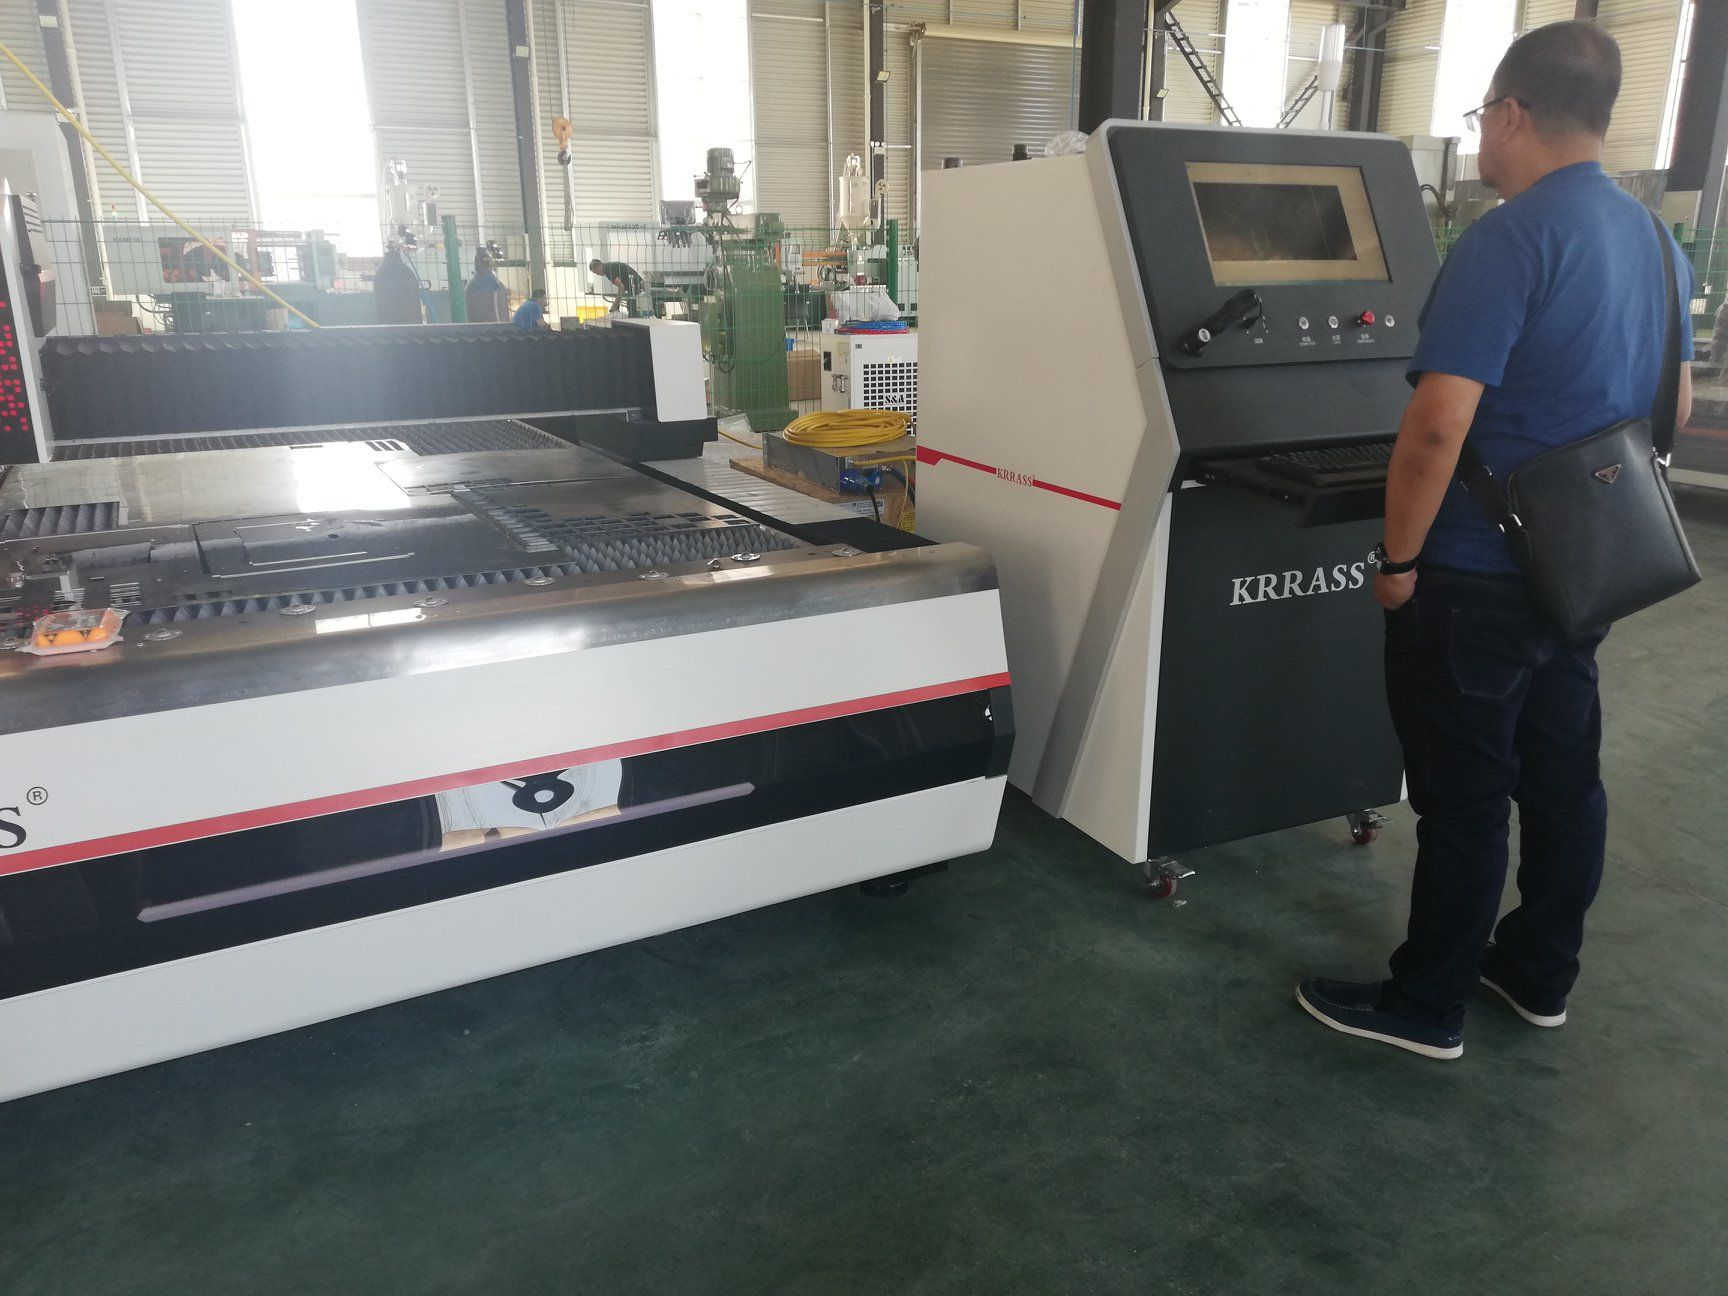 Pin On Krrass Fiber Laser Cutting Machine